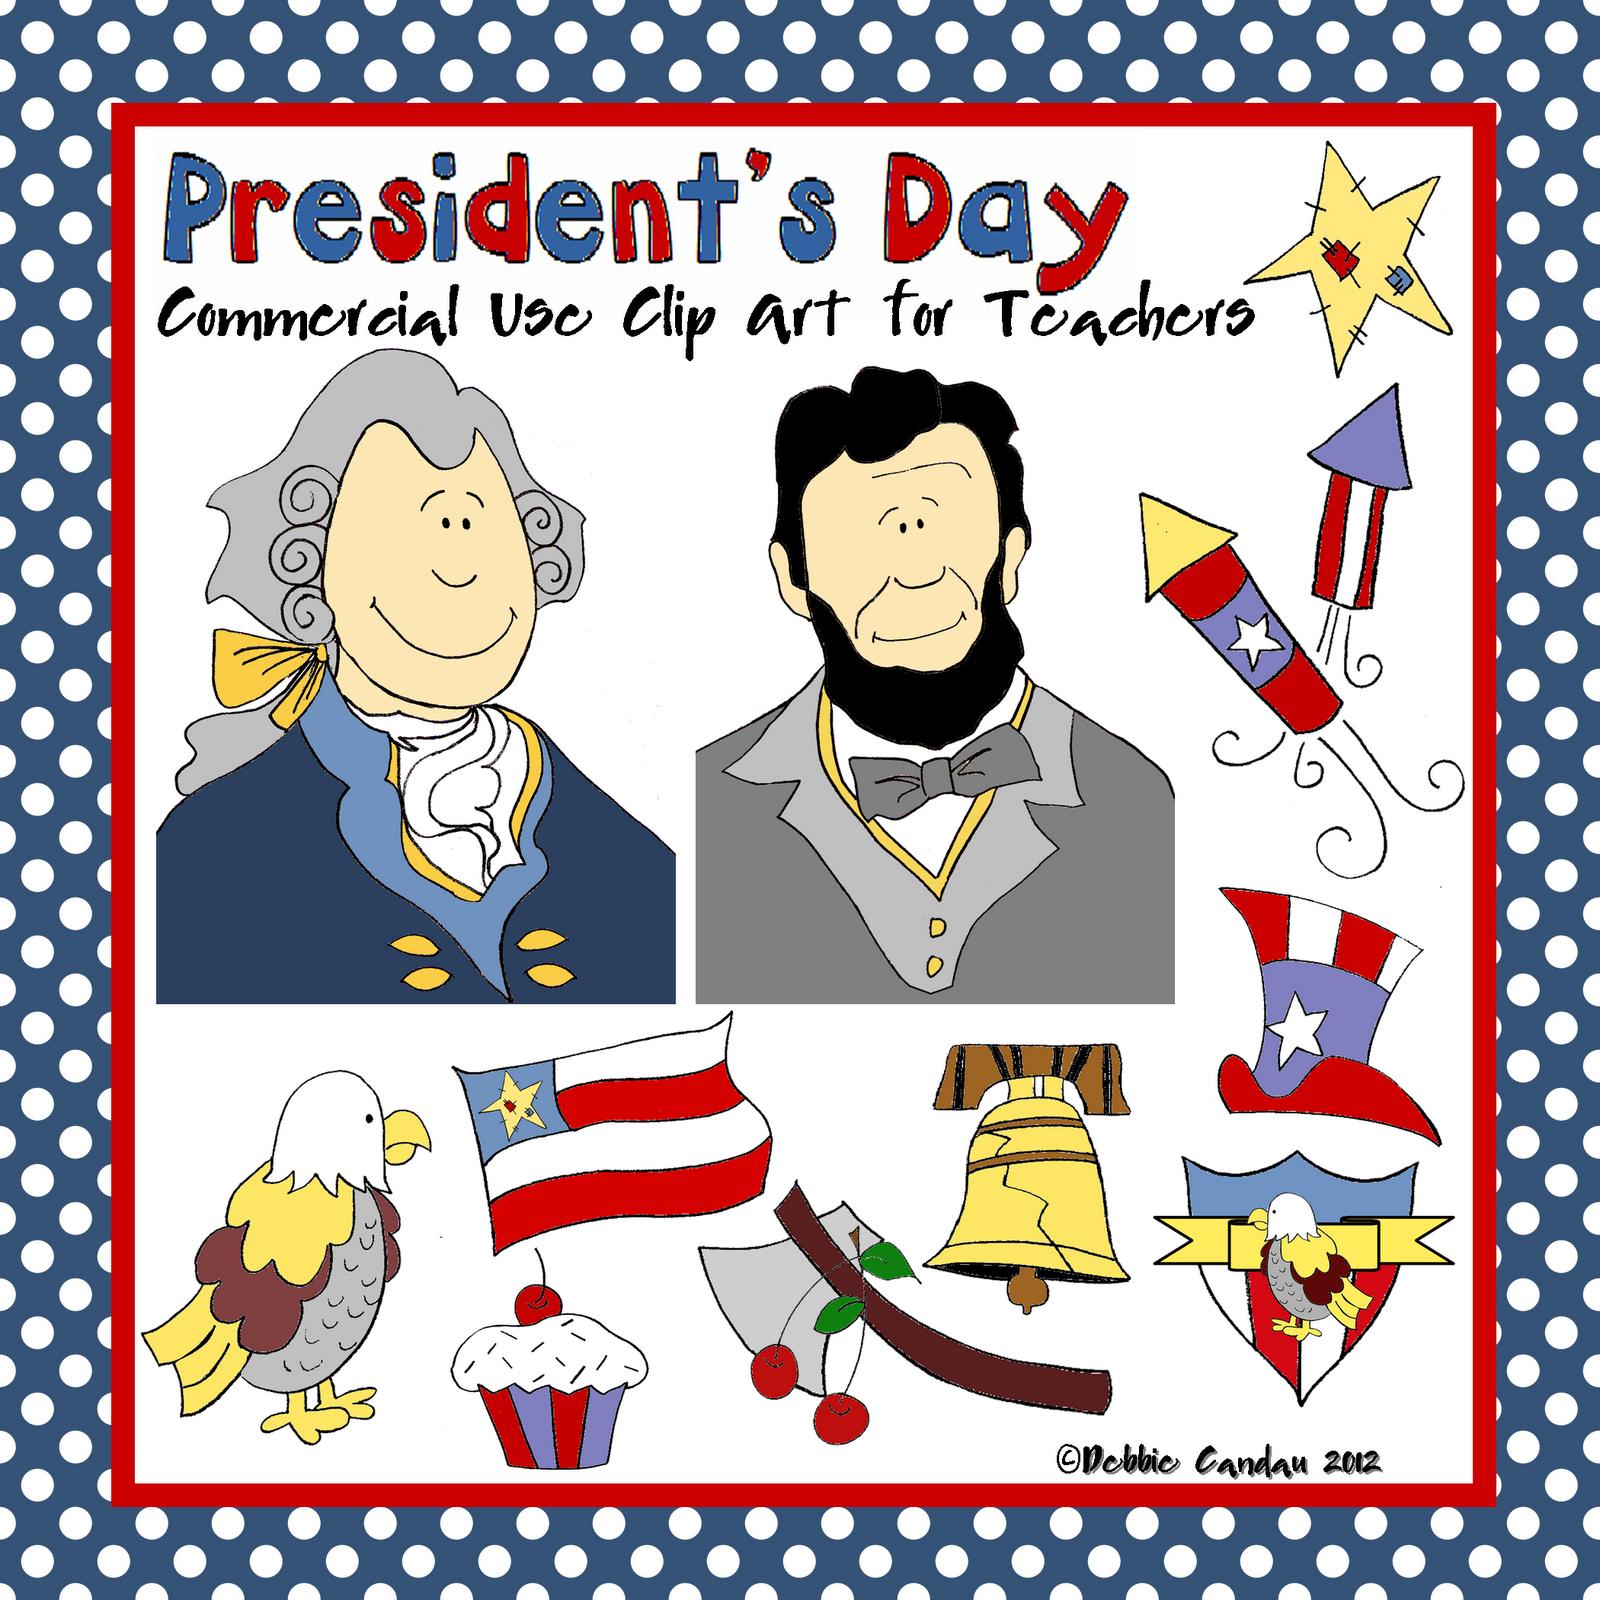 The Alphabet Garden: Free President's Day Poem! |Presidents Day Clip Art